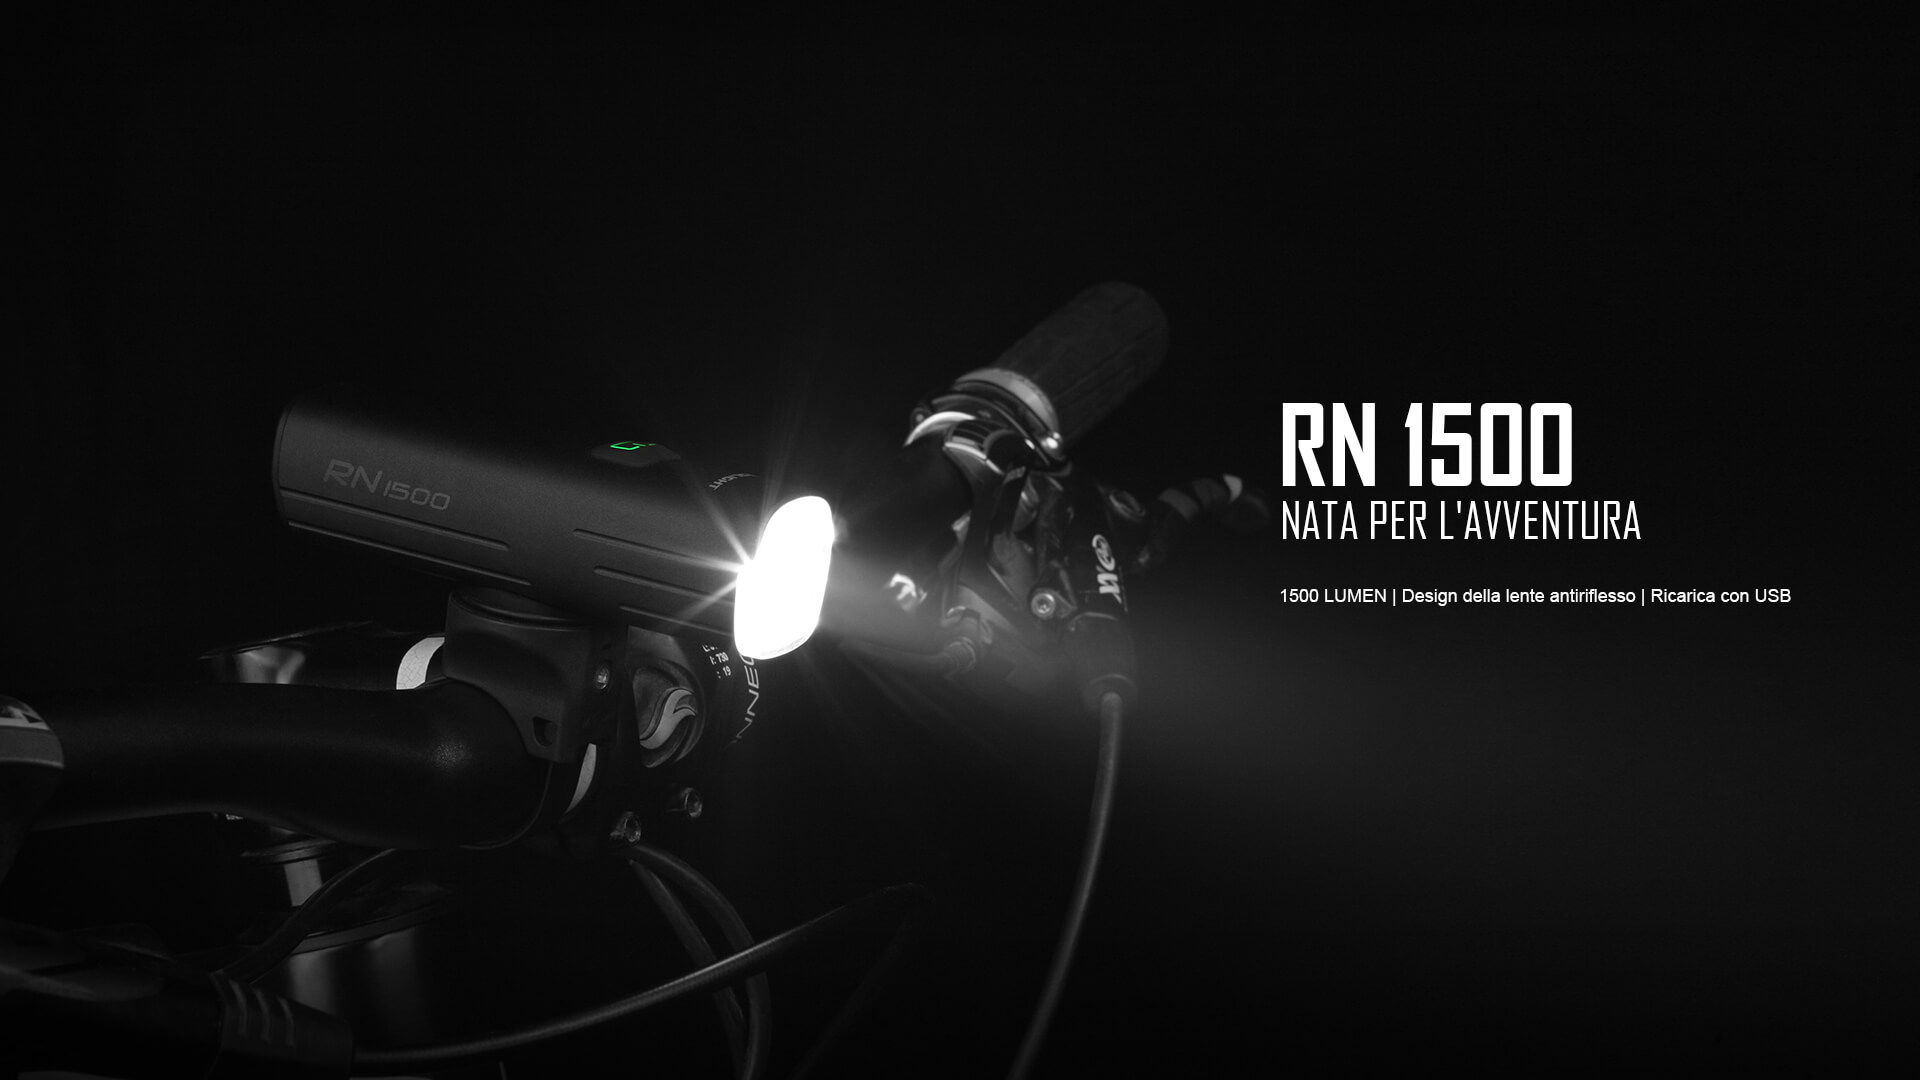 RN 1500, torce da bici